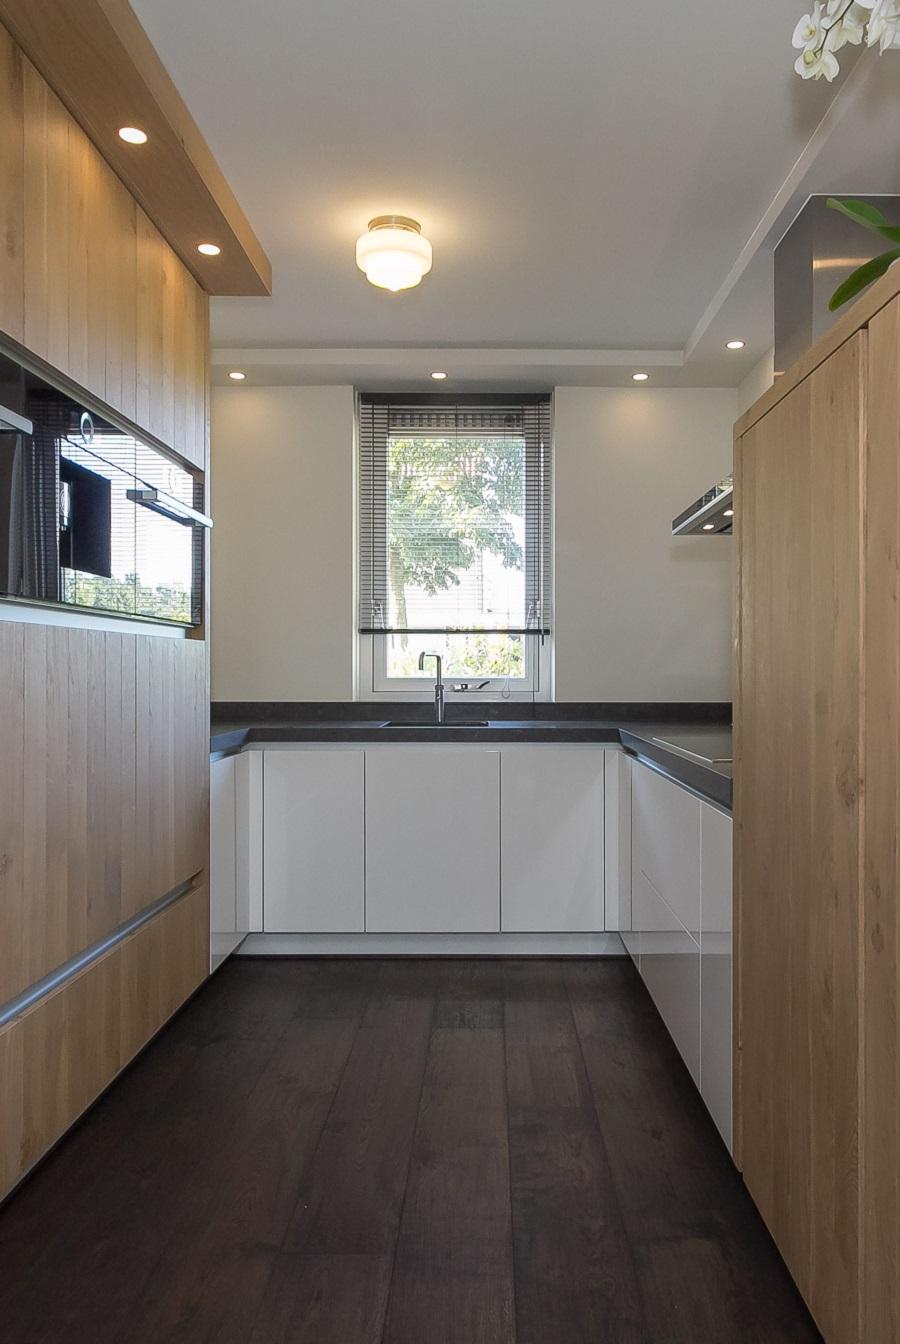 Interieur, houten vloeren, kasten, keukens, tafels, lambrisering ...